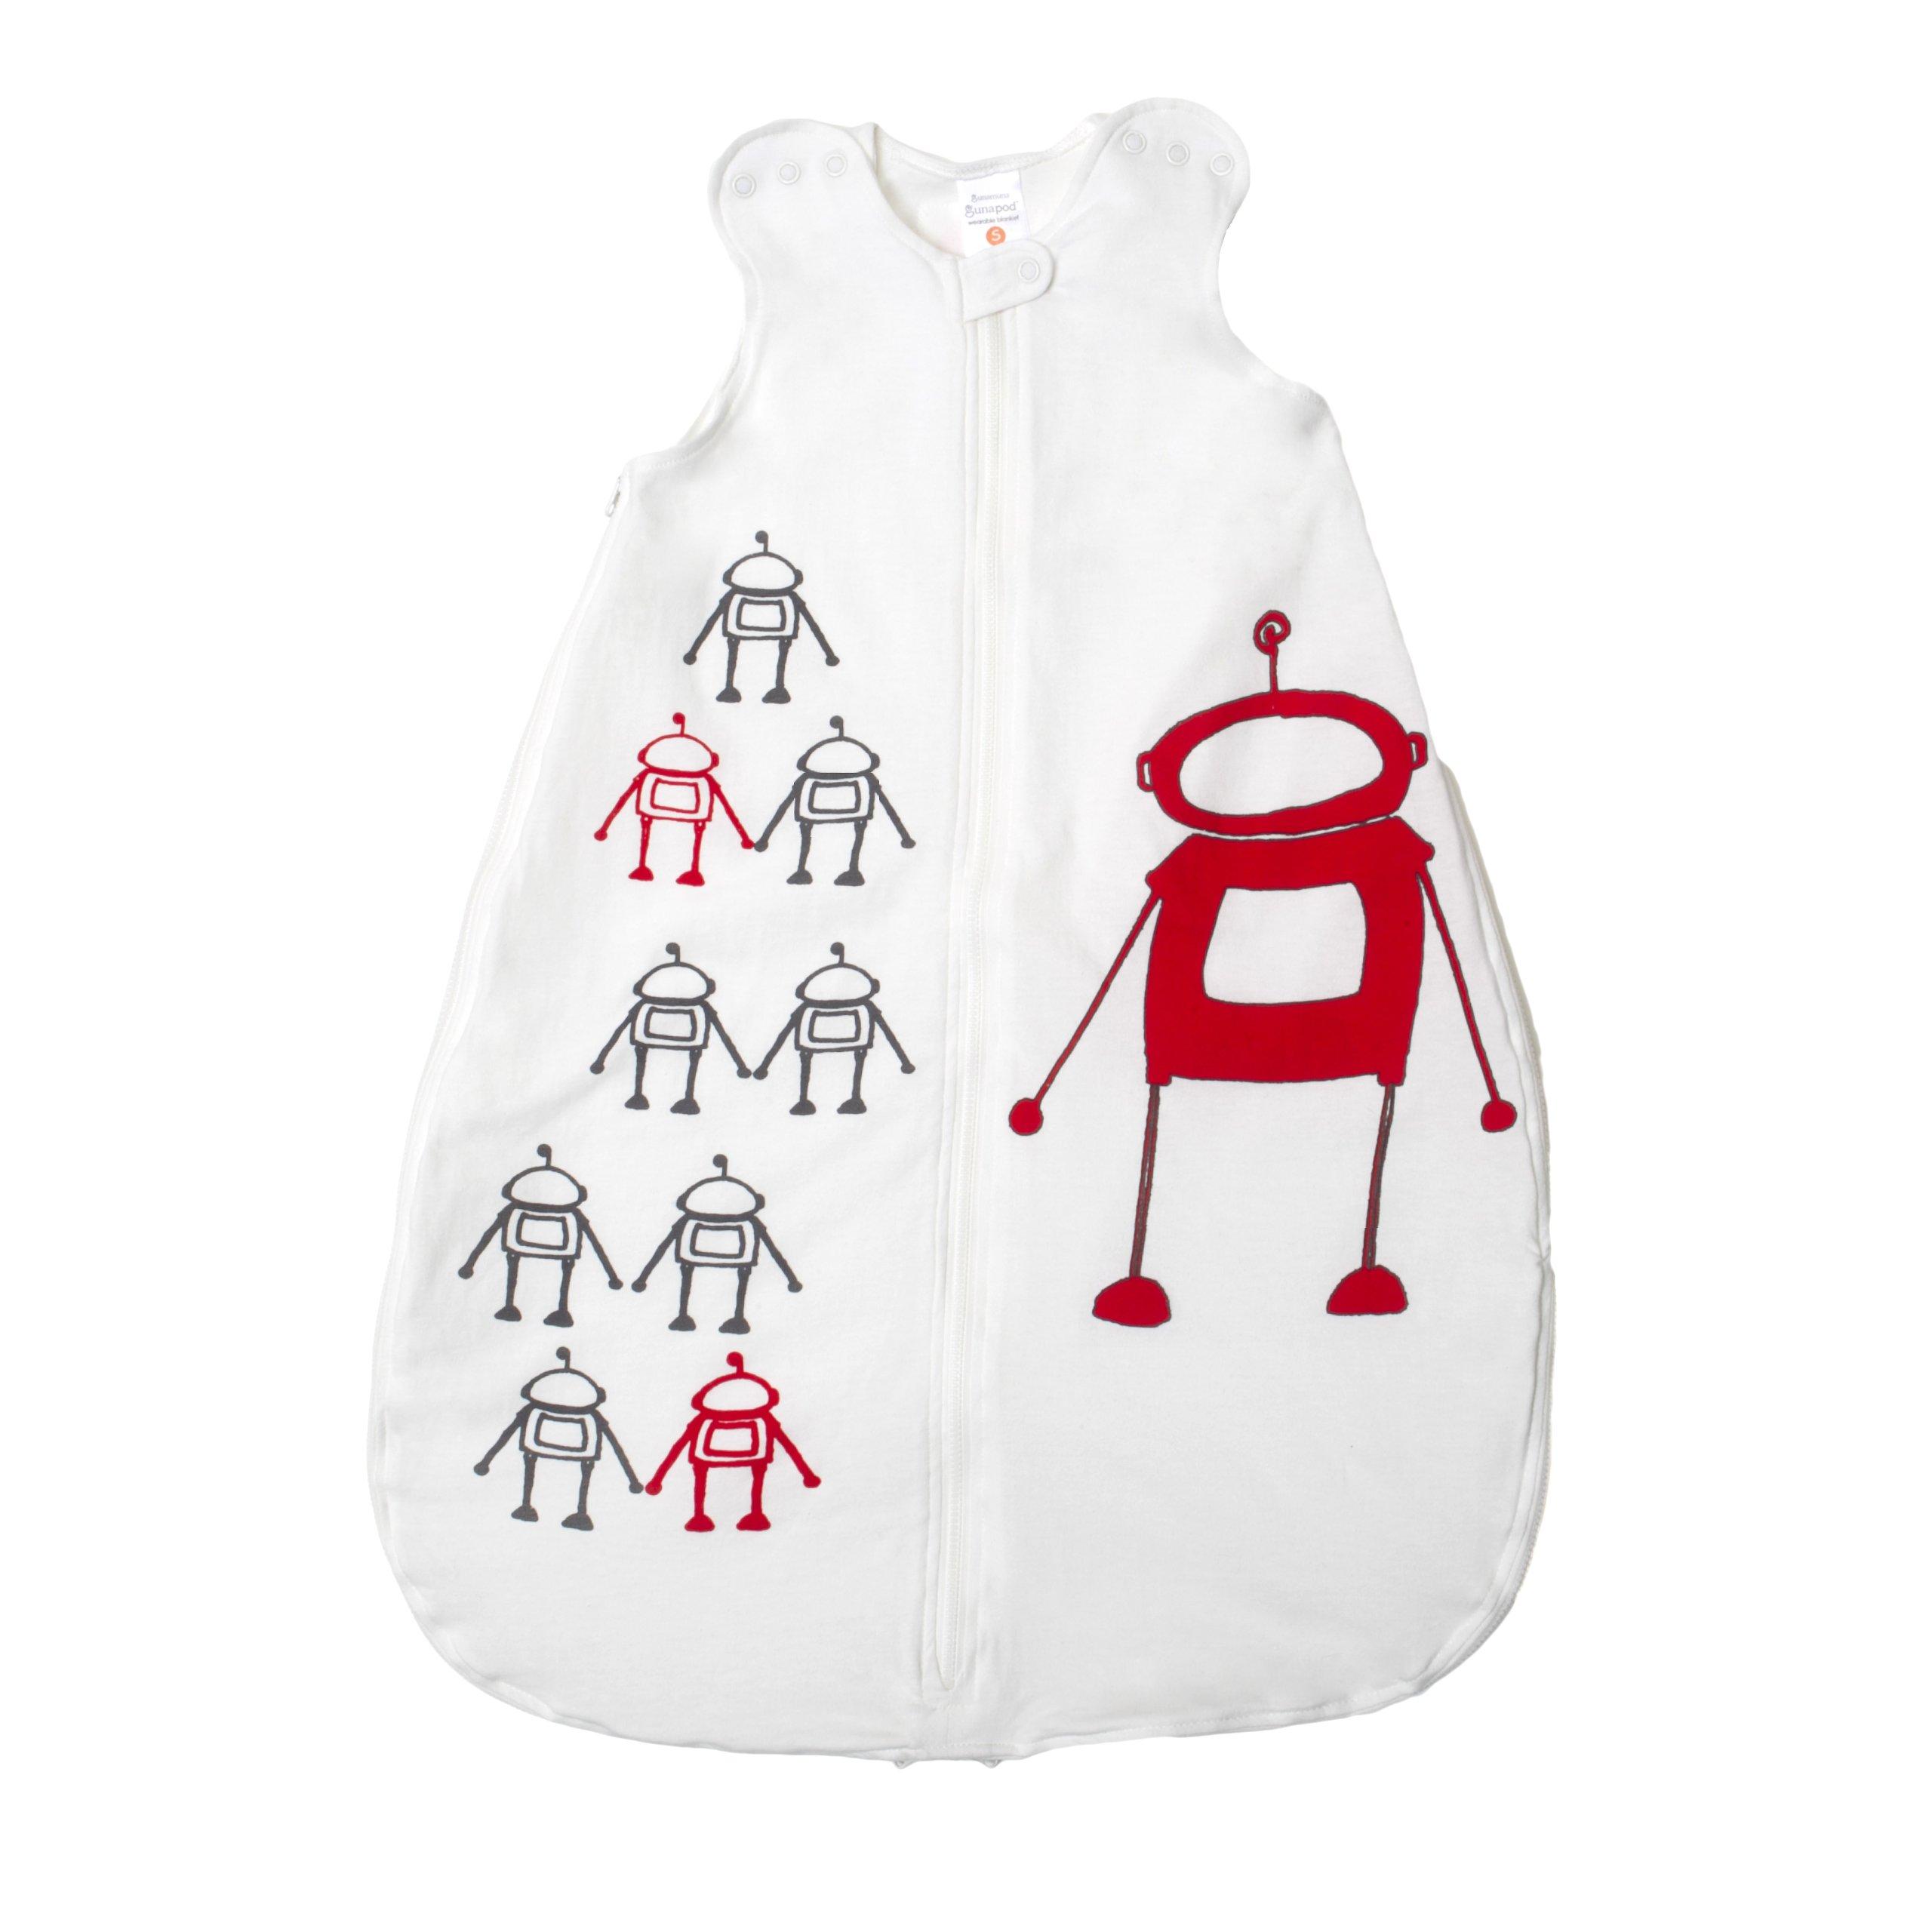 Gunamuna Cotton Dreams Gunapod Wearable Baby Sleepsack, Robot, Small